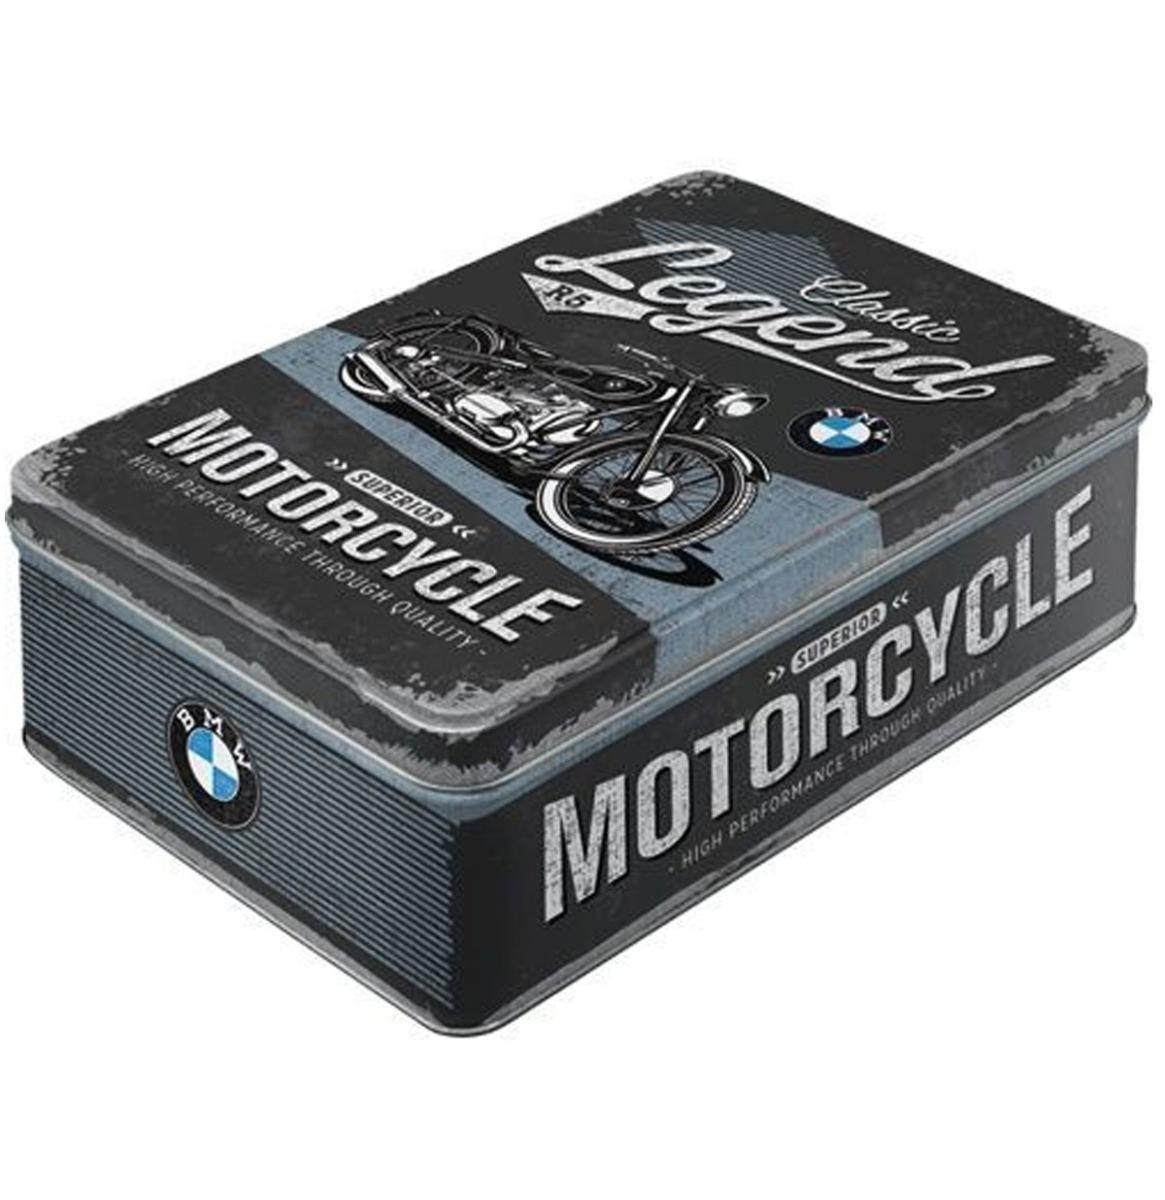 BMW Classic Legend Motor Tinnen Plat Blik